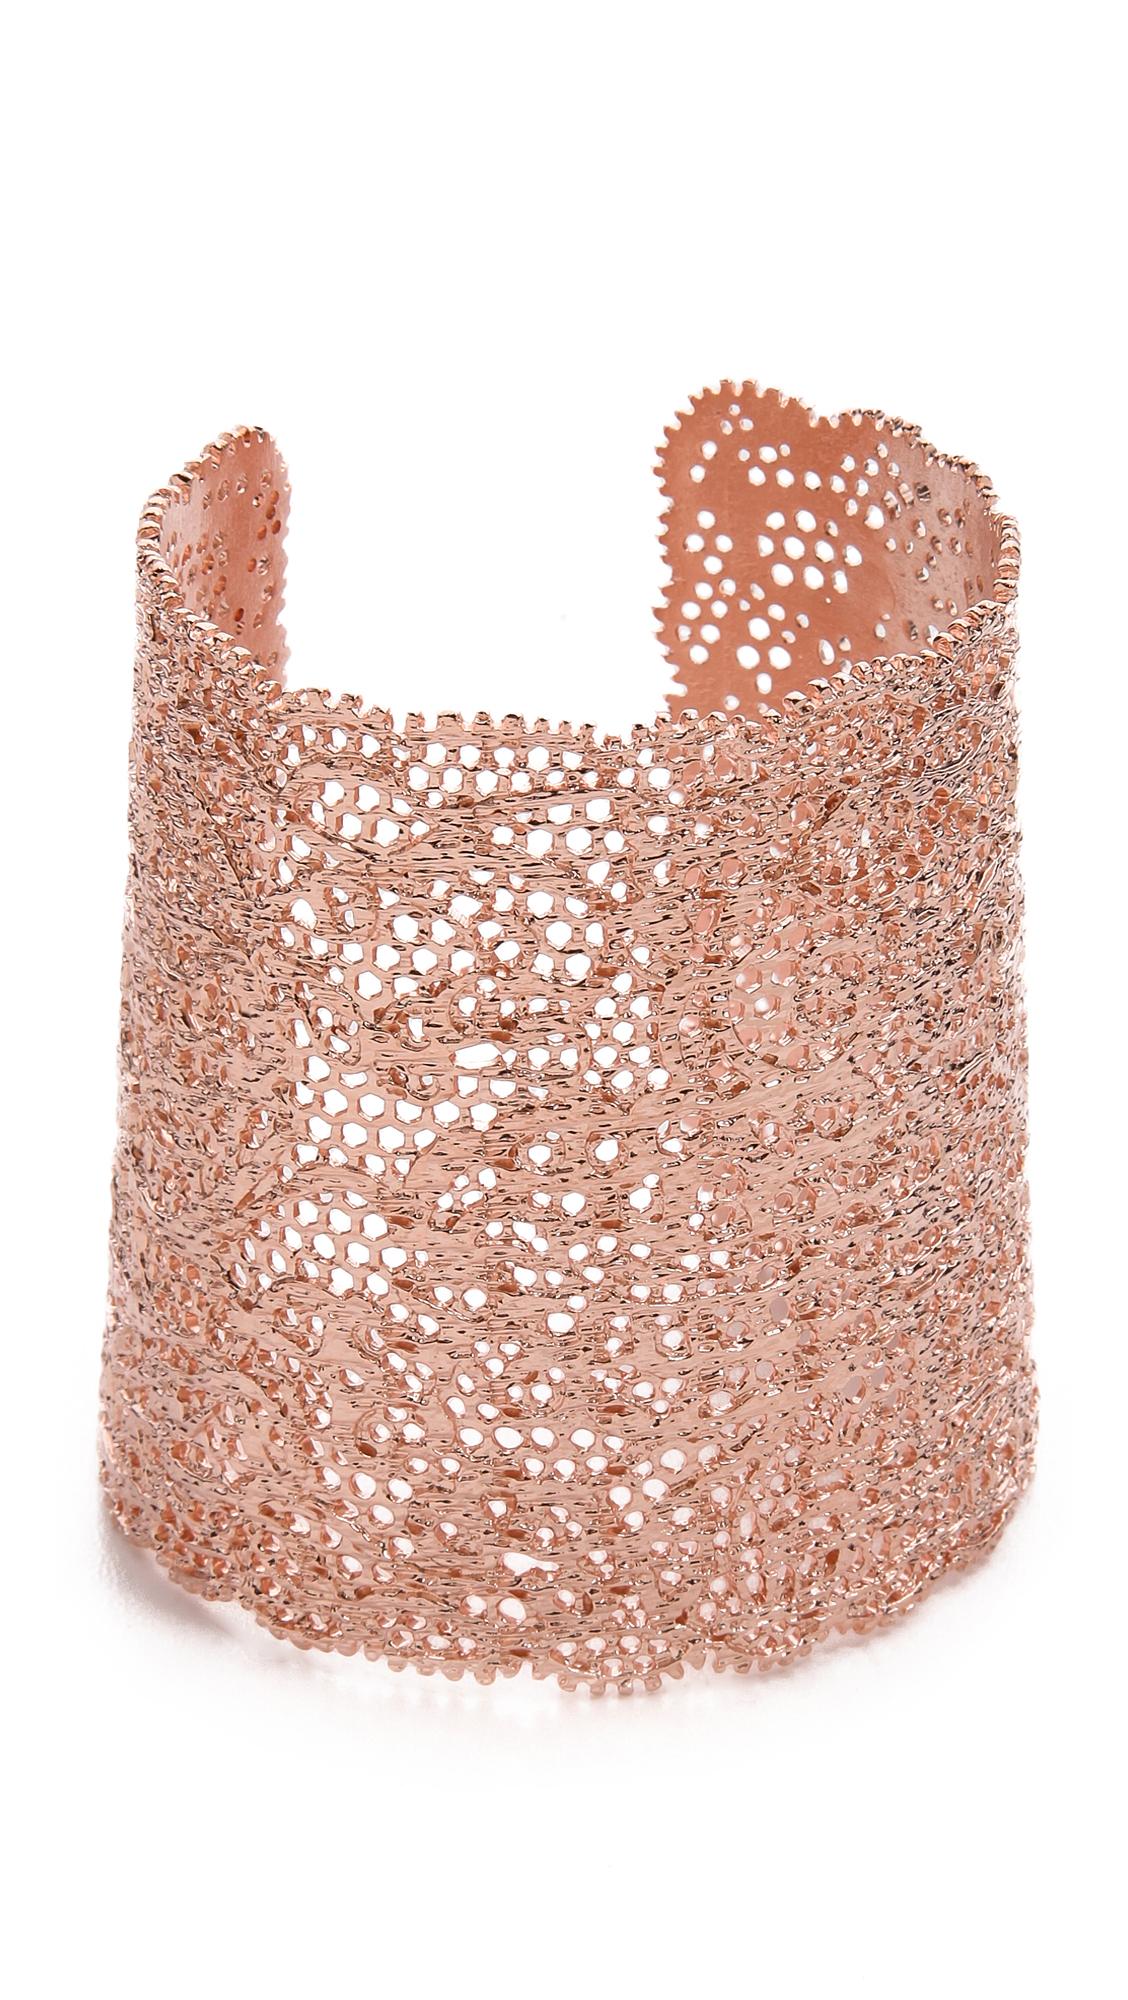 Aurelie Bidermann Vintage Lace Cuff - Rose Gold at Shopbop